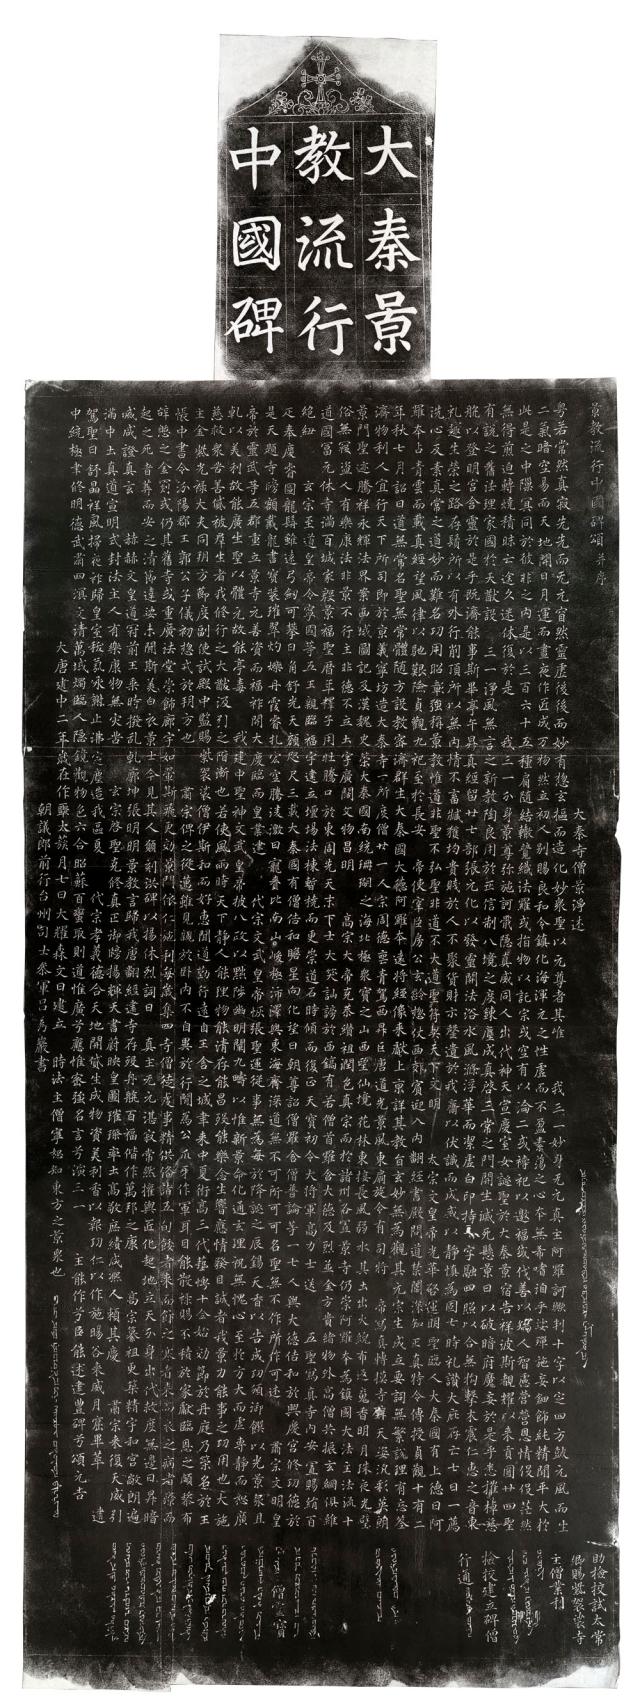 Nestorian stele